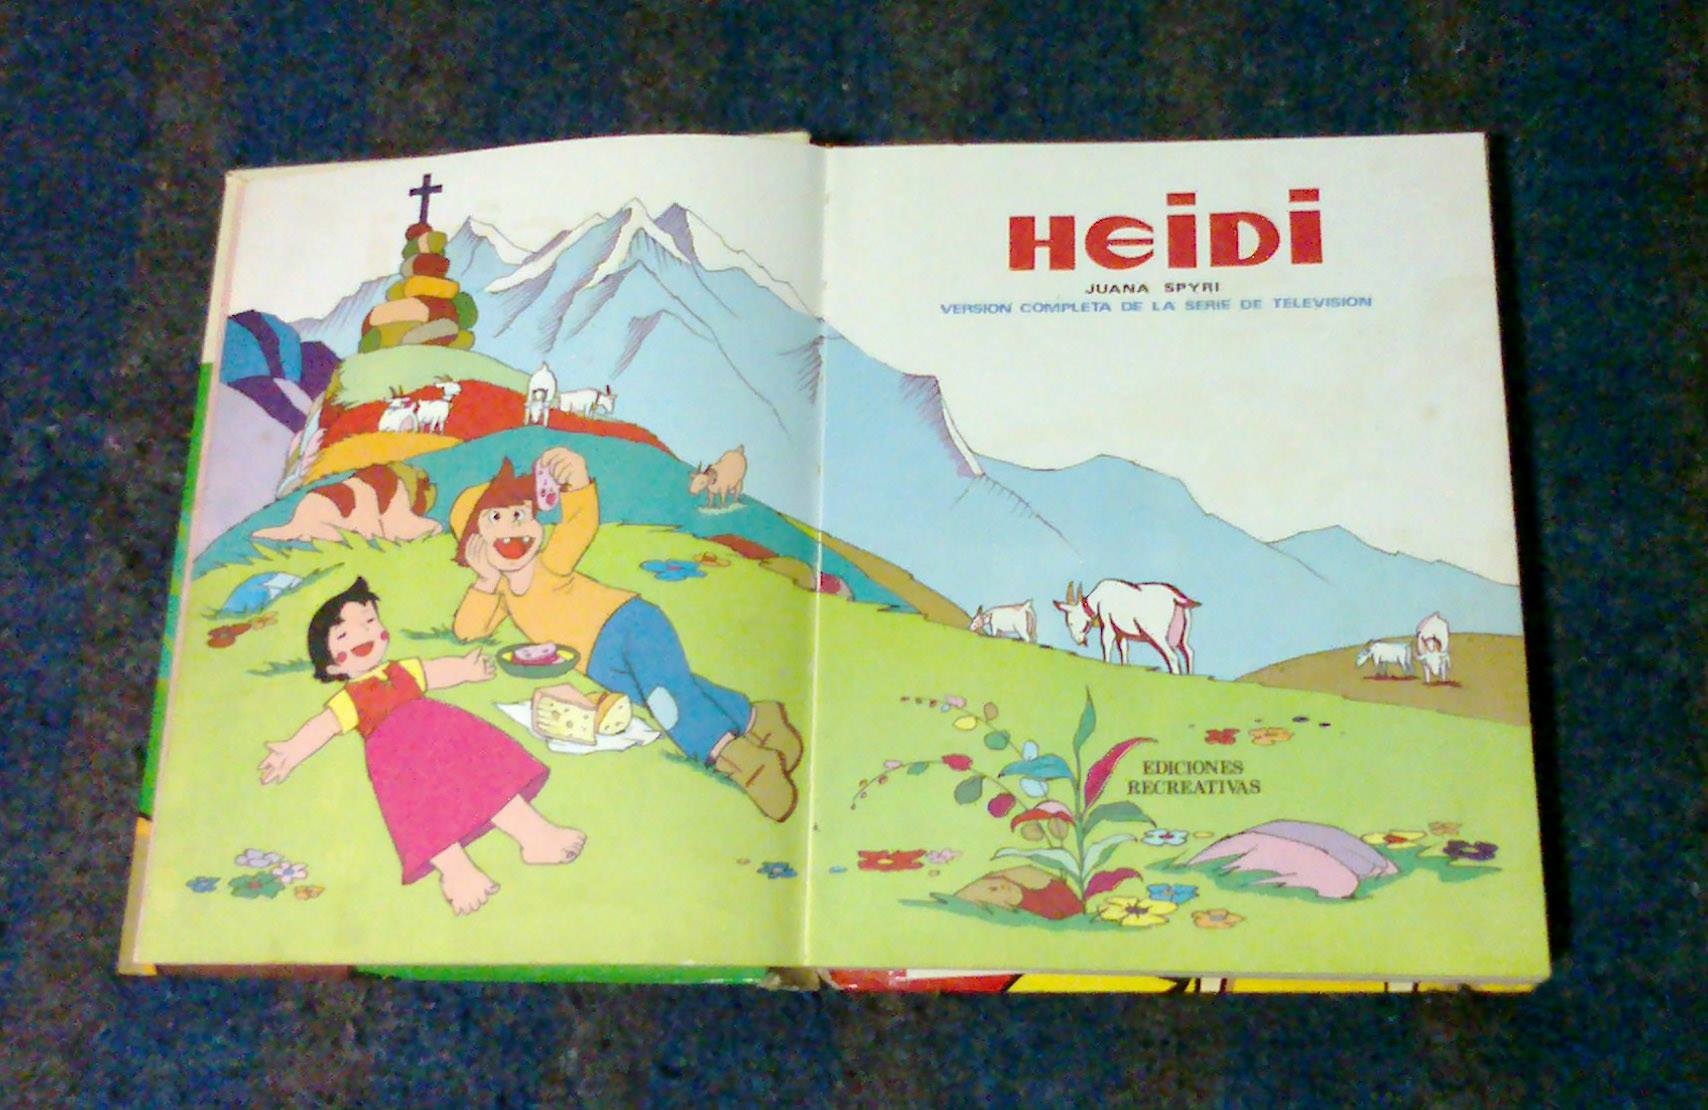 heidi-1976